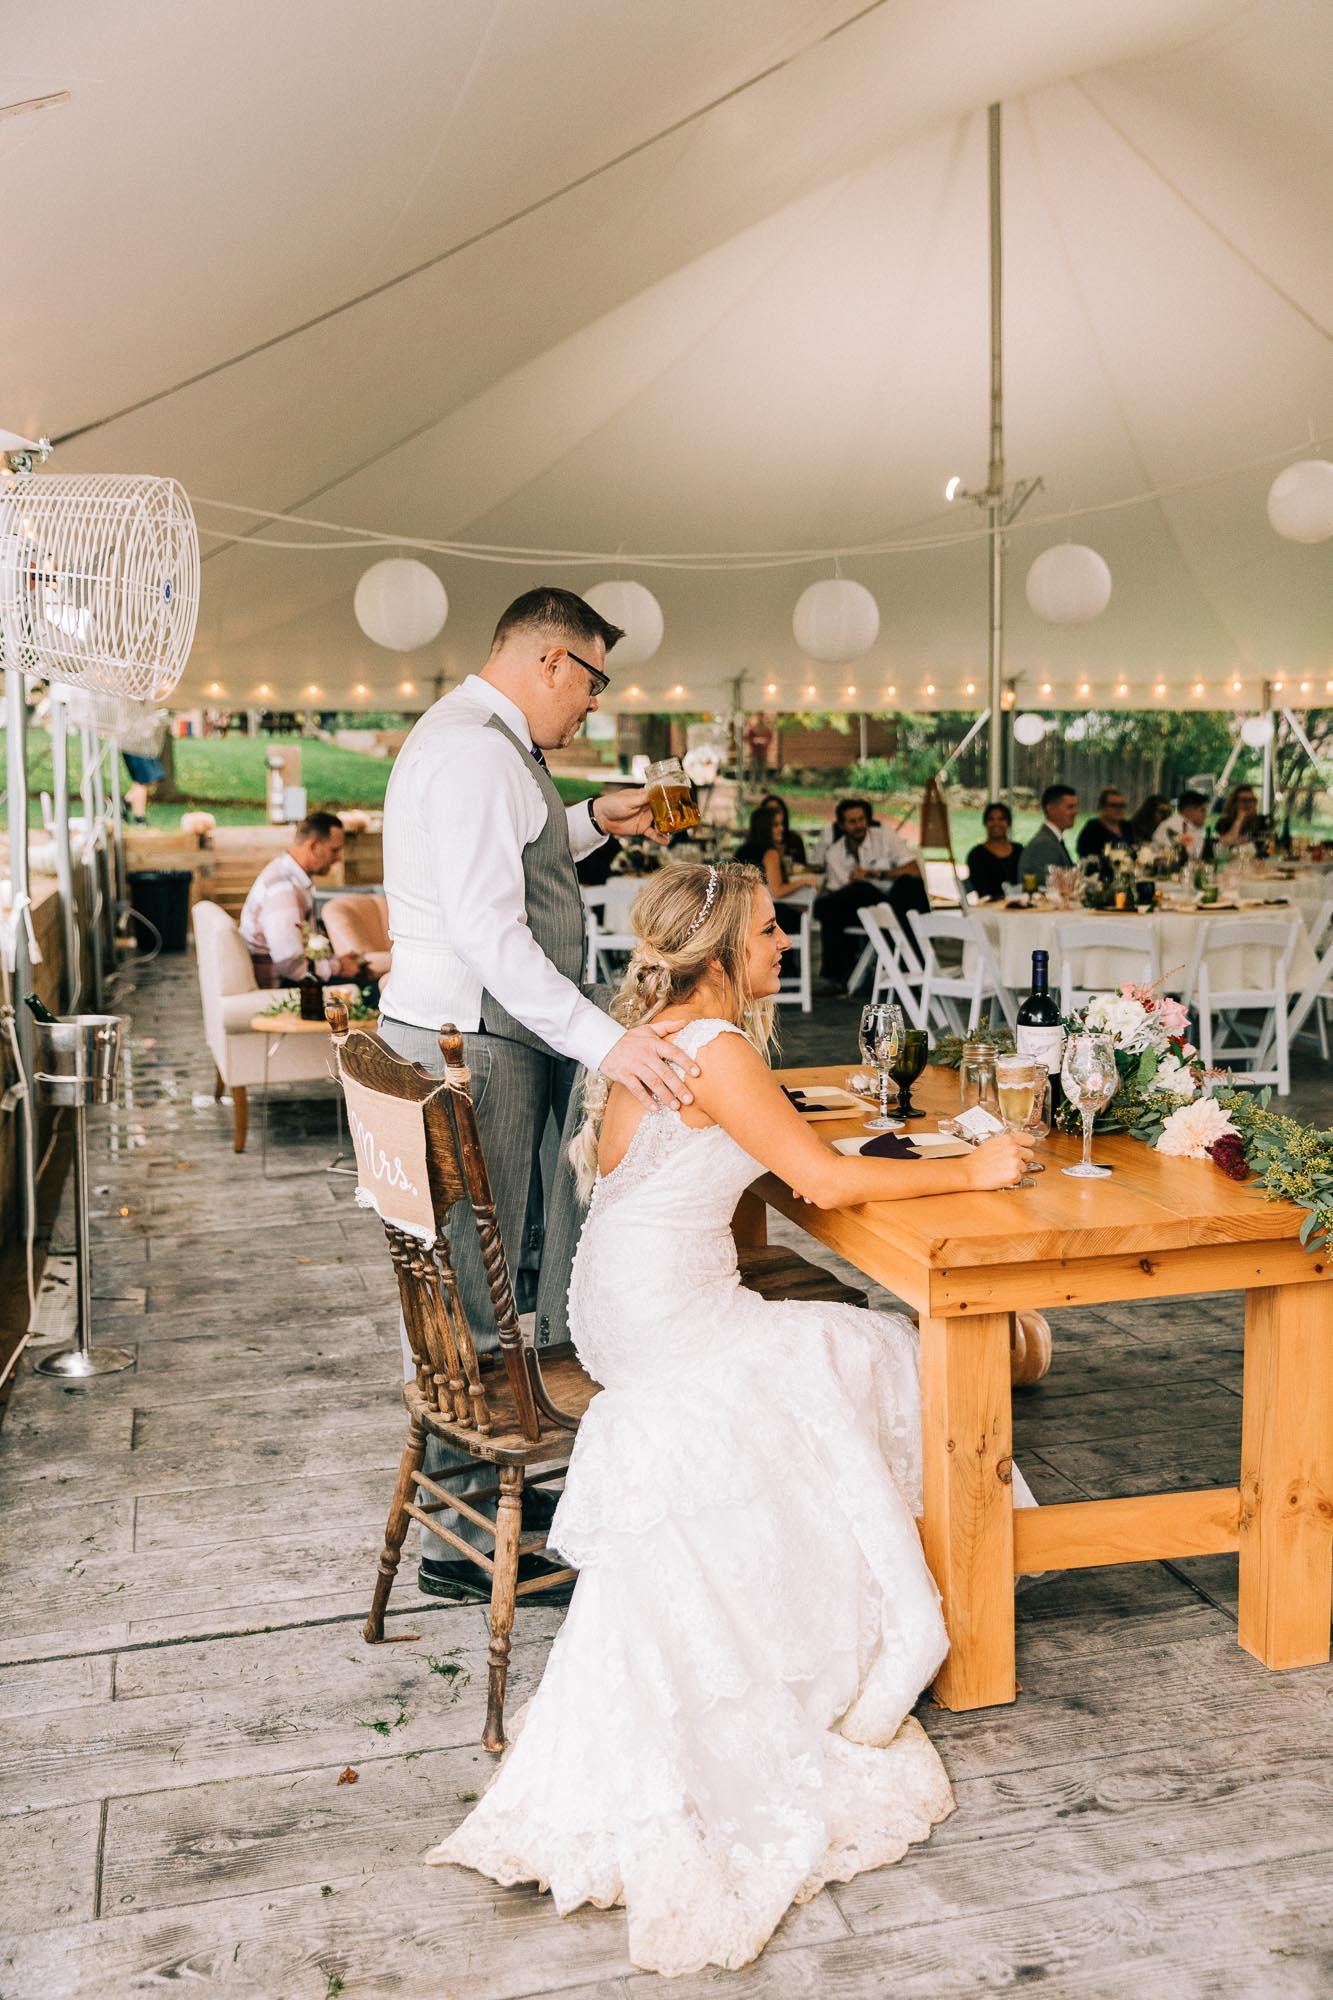 Lodge-at-Raven-Creek-October-wedding-72.jpg